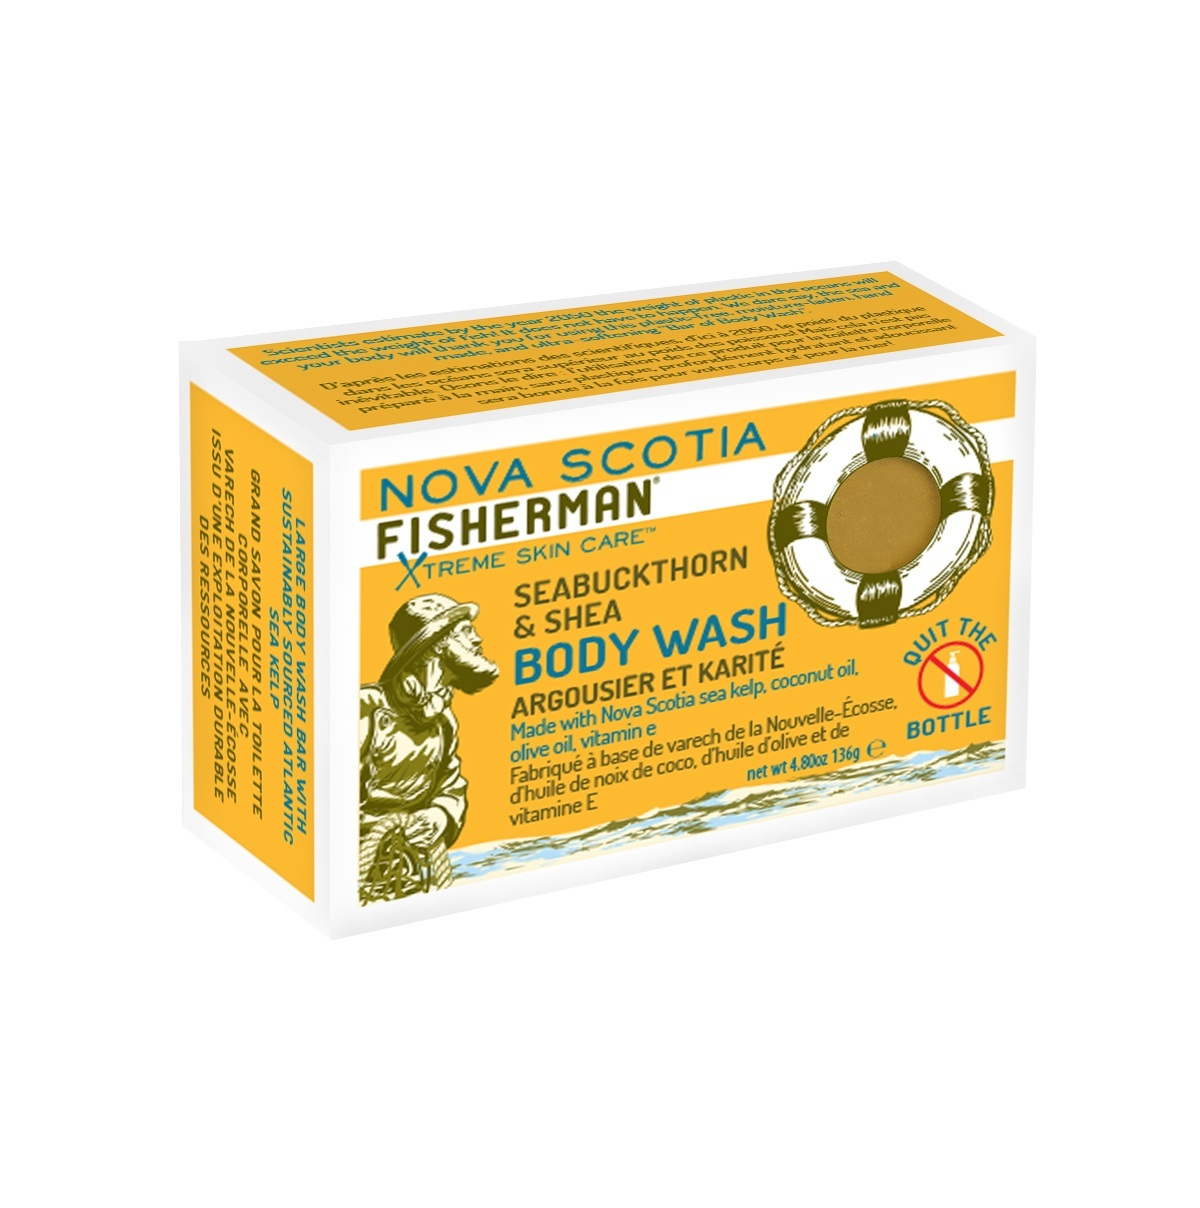 NOVA SCOTIA FISHERMAN(ノバスコシアフィッシャーマン) BODY WASH BAR シーバックソーン& シアバターソープ